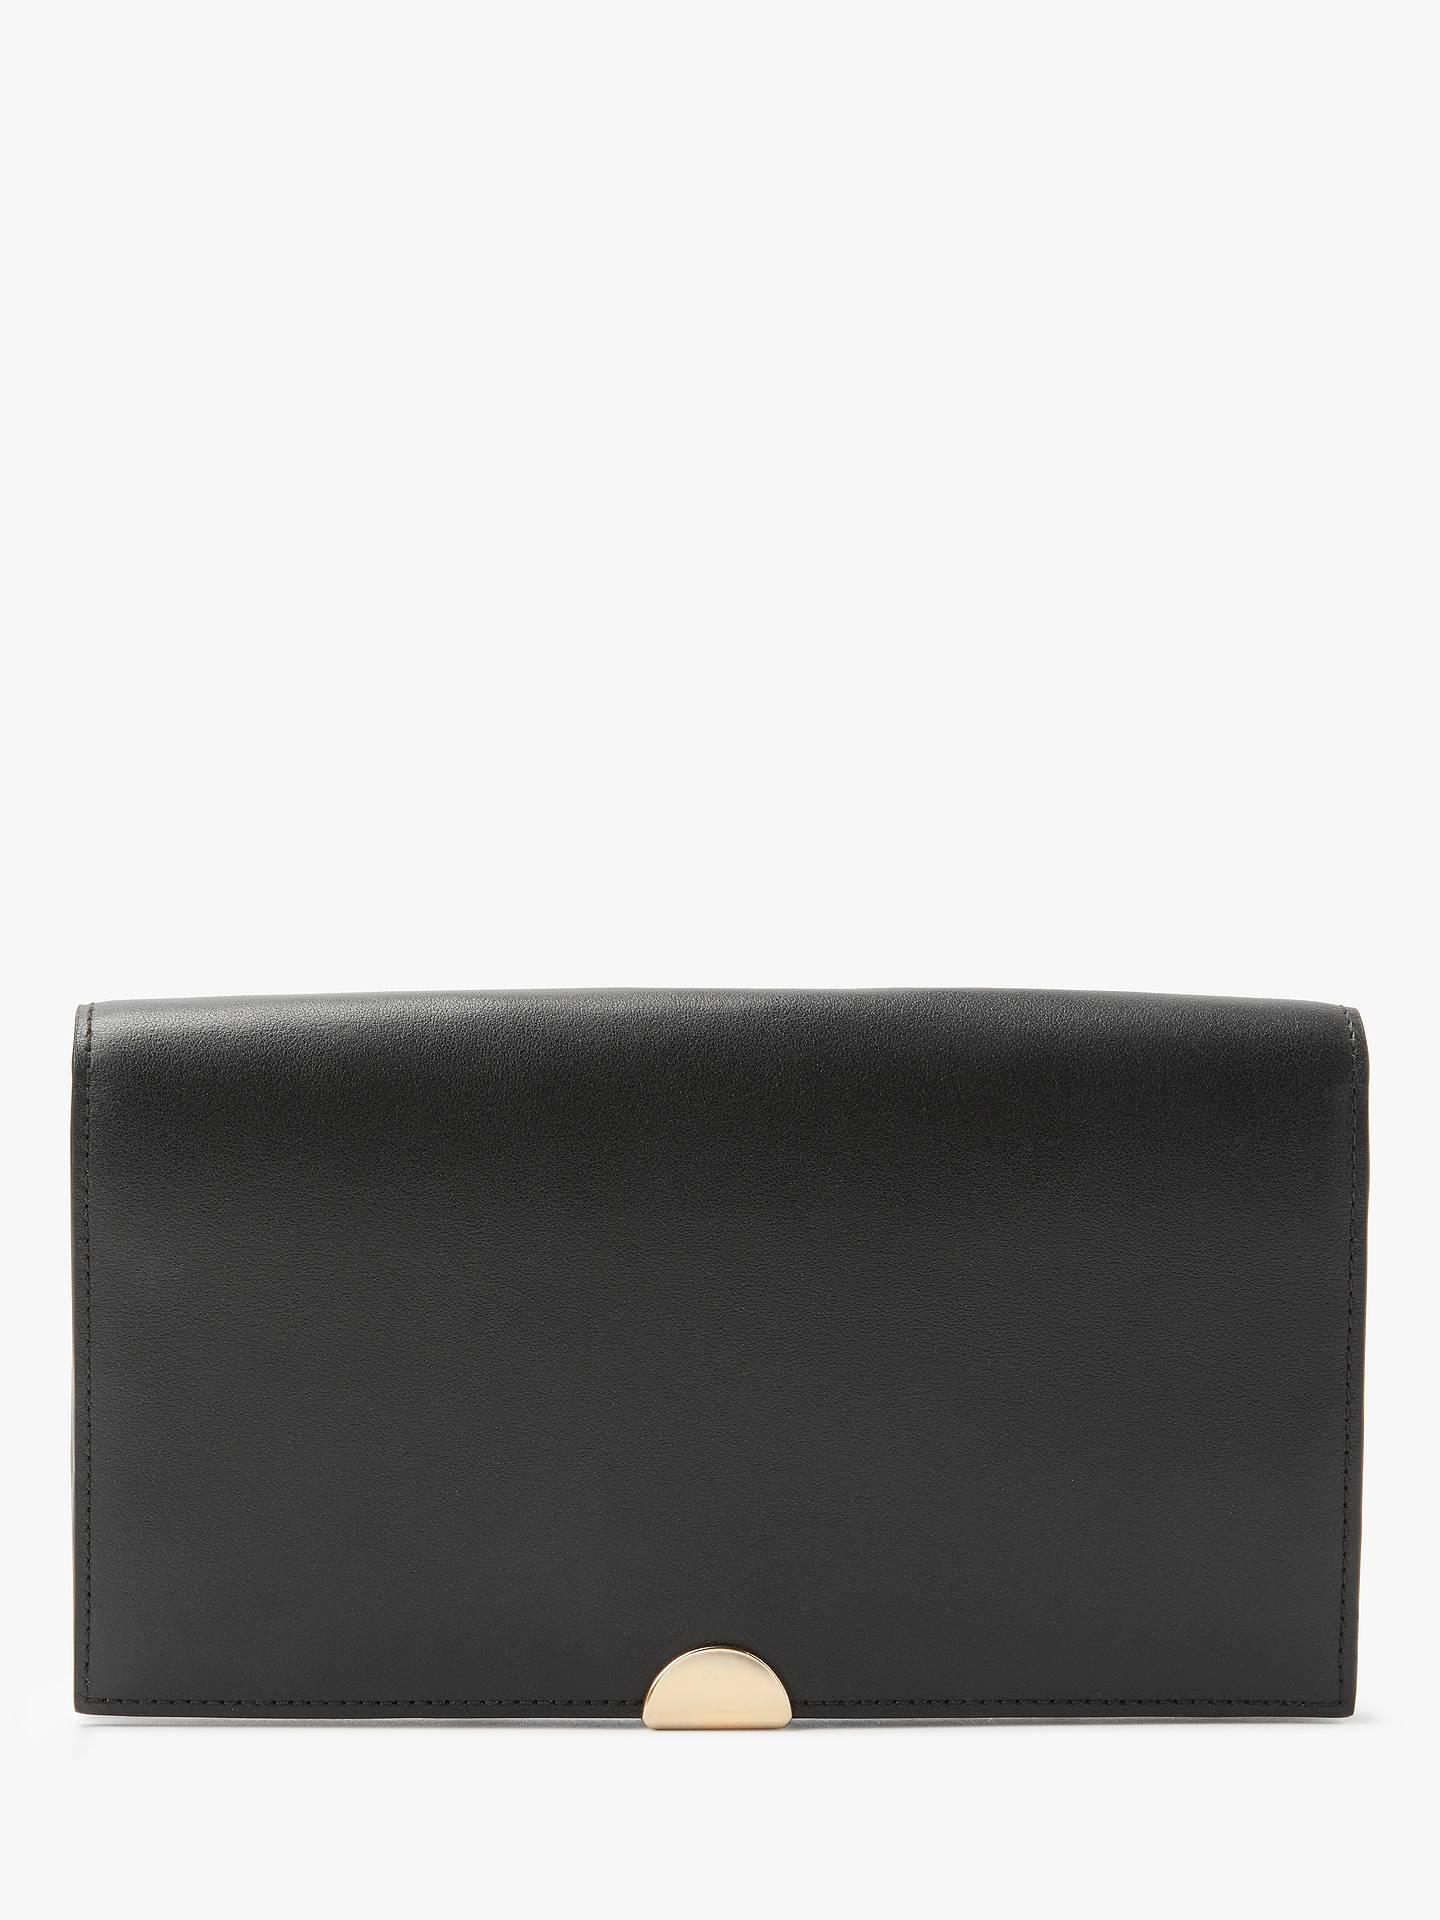 71a1f1ae1d Buy Coach Dreamer Leather Clutch Purse, Black Online at johnlewis.com ...